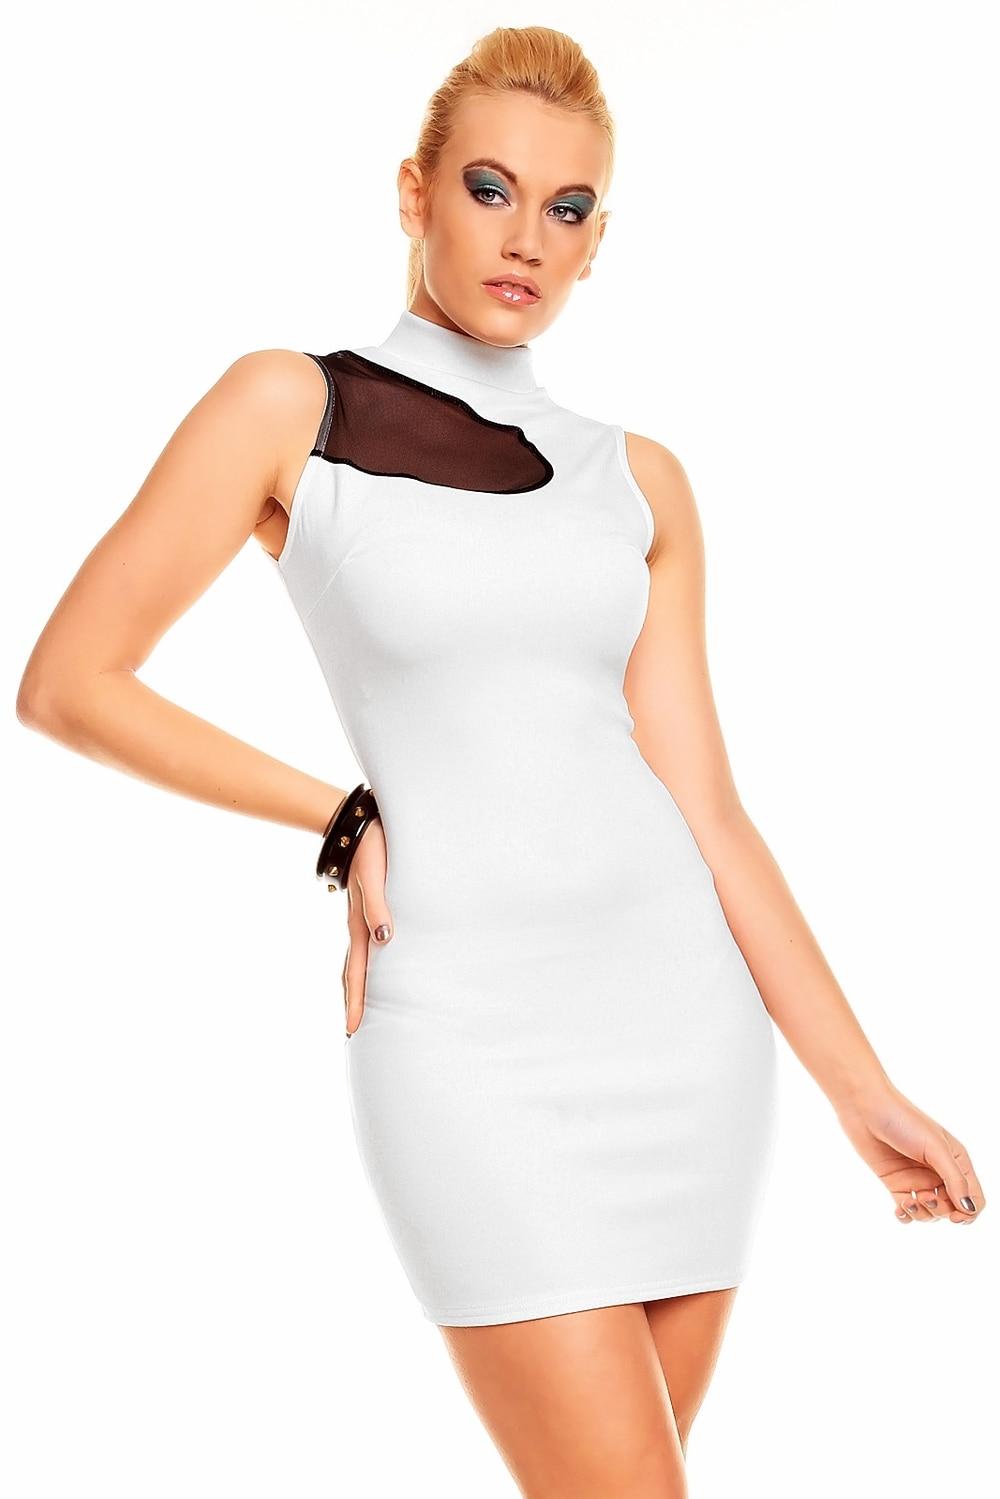 Free Shipping Sexy Peplum Business Style Office Lady White Elegant  Newly Fashion Dress